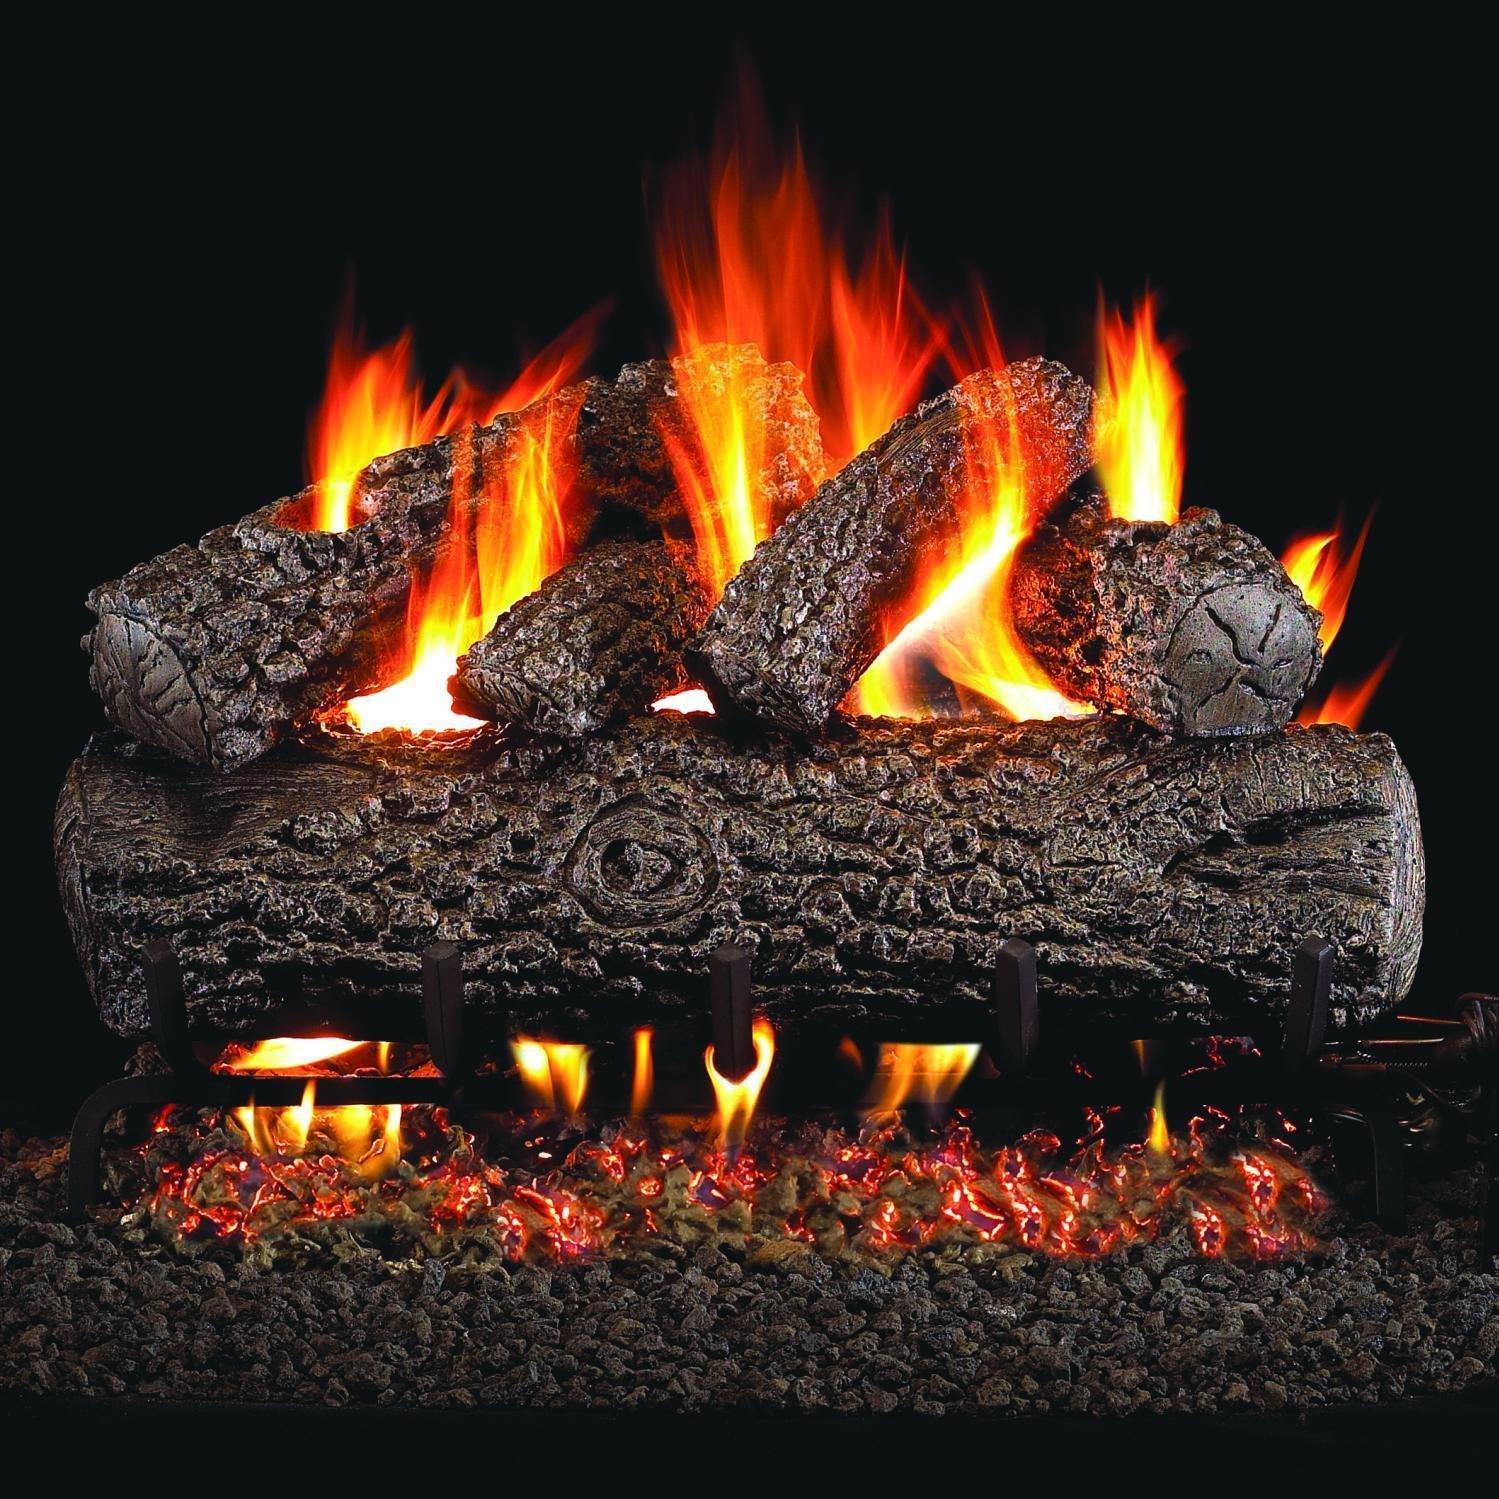 vented fireplace logs amazon com rh amazon com Amazon Fancy Fireplaces Amazon Outdoor Gas Fire Pit